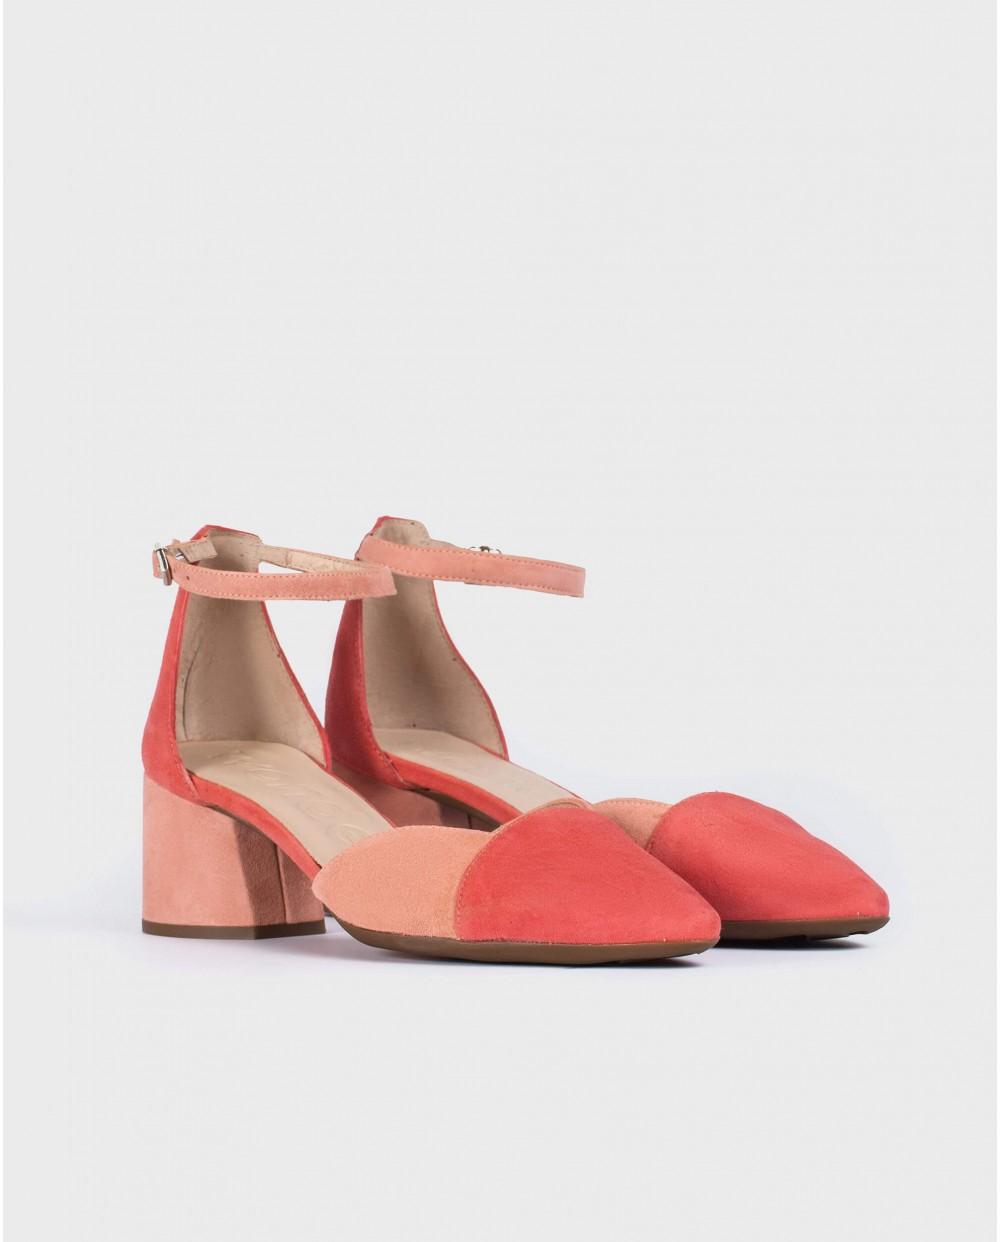 Wonders-Women-Two-tone suede leather shoe